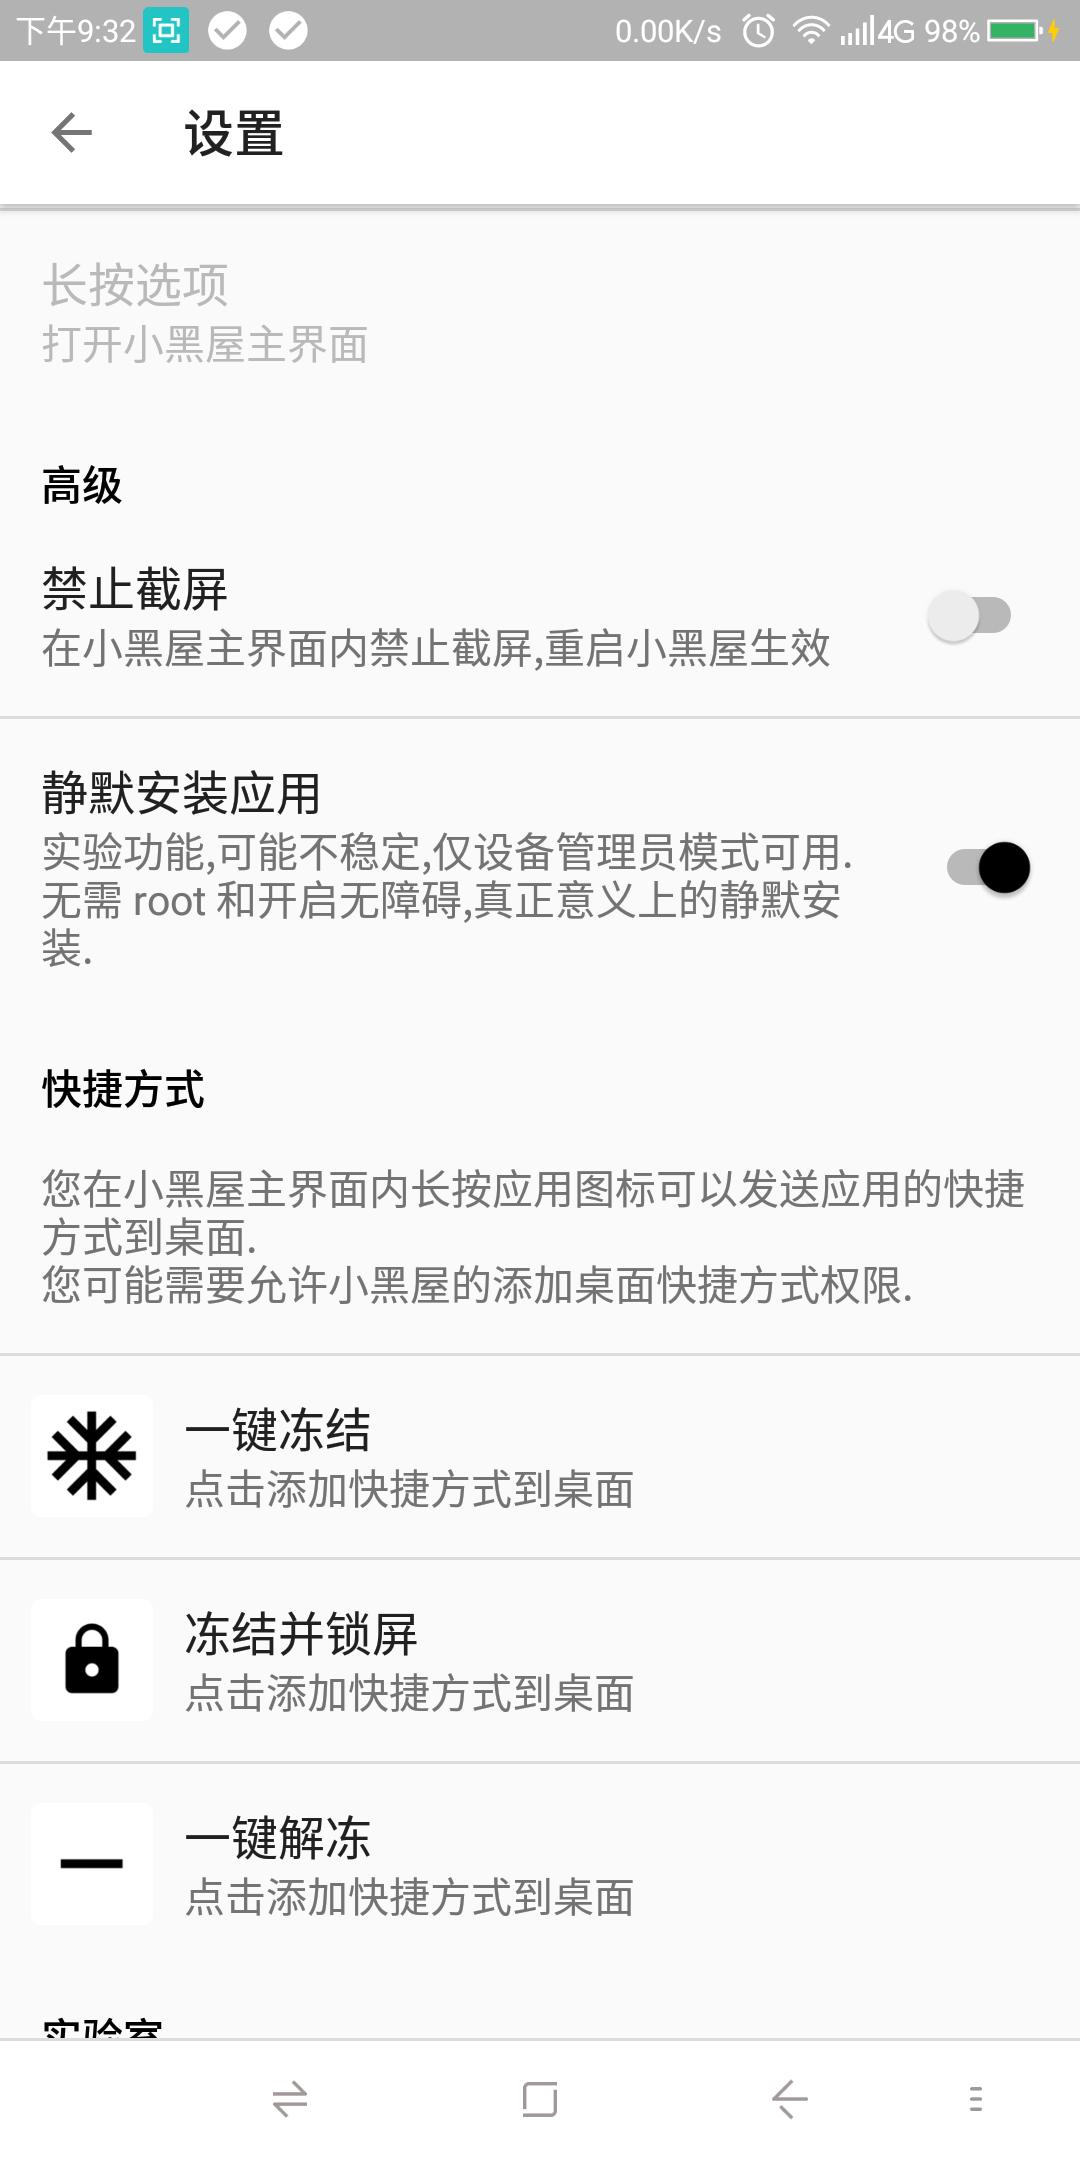 Screenshot_2018-11-20-21-32-21.png